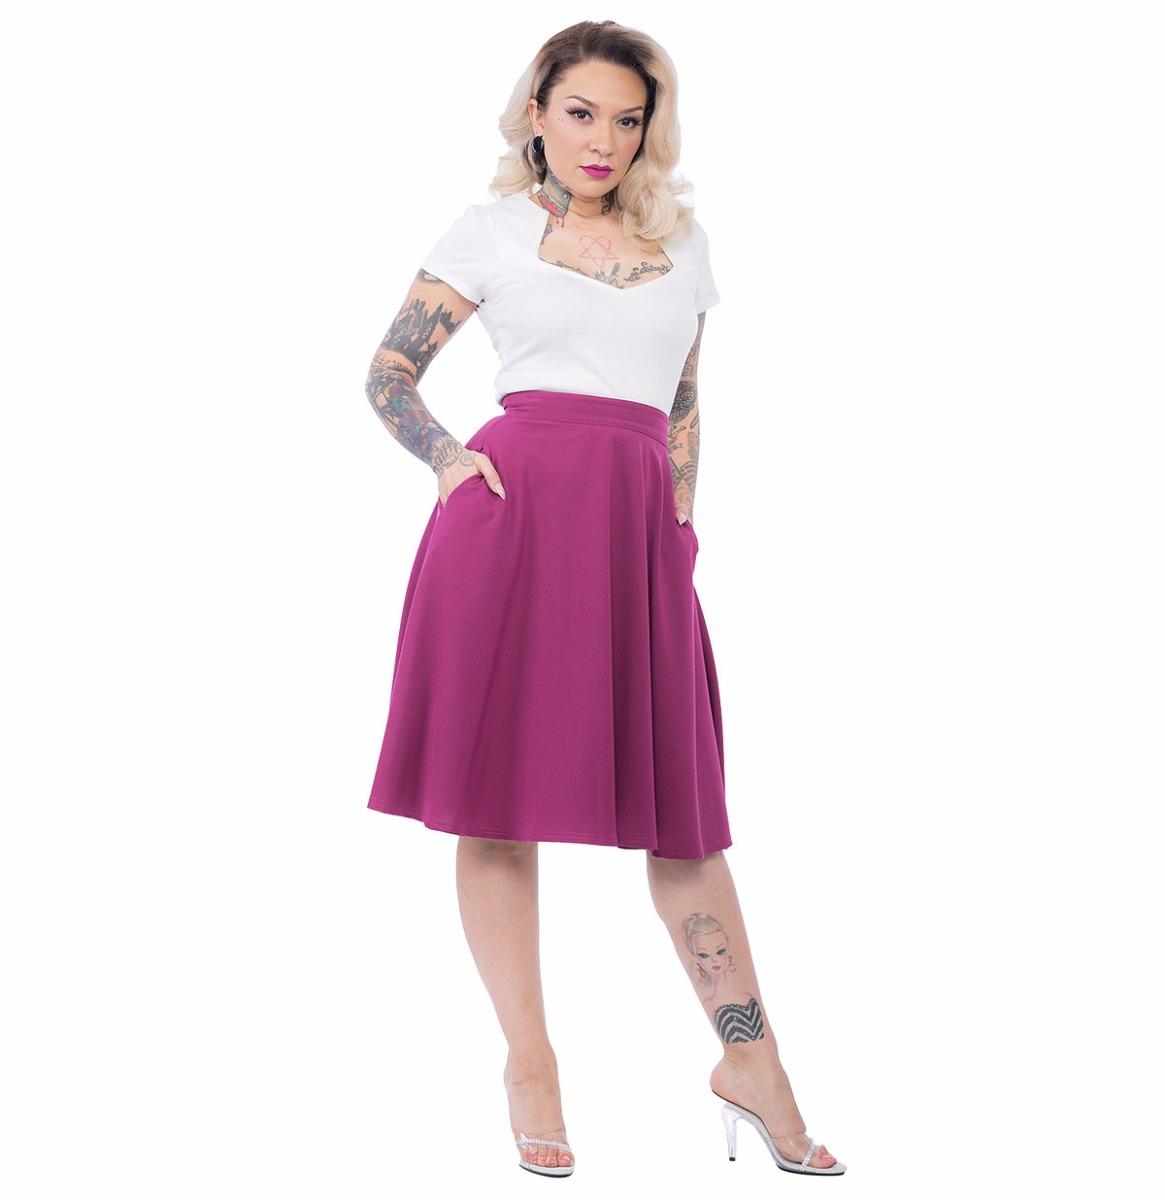 Pocket High Waist Thrills Skirt Magenta